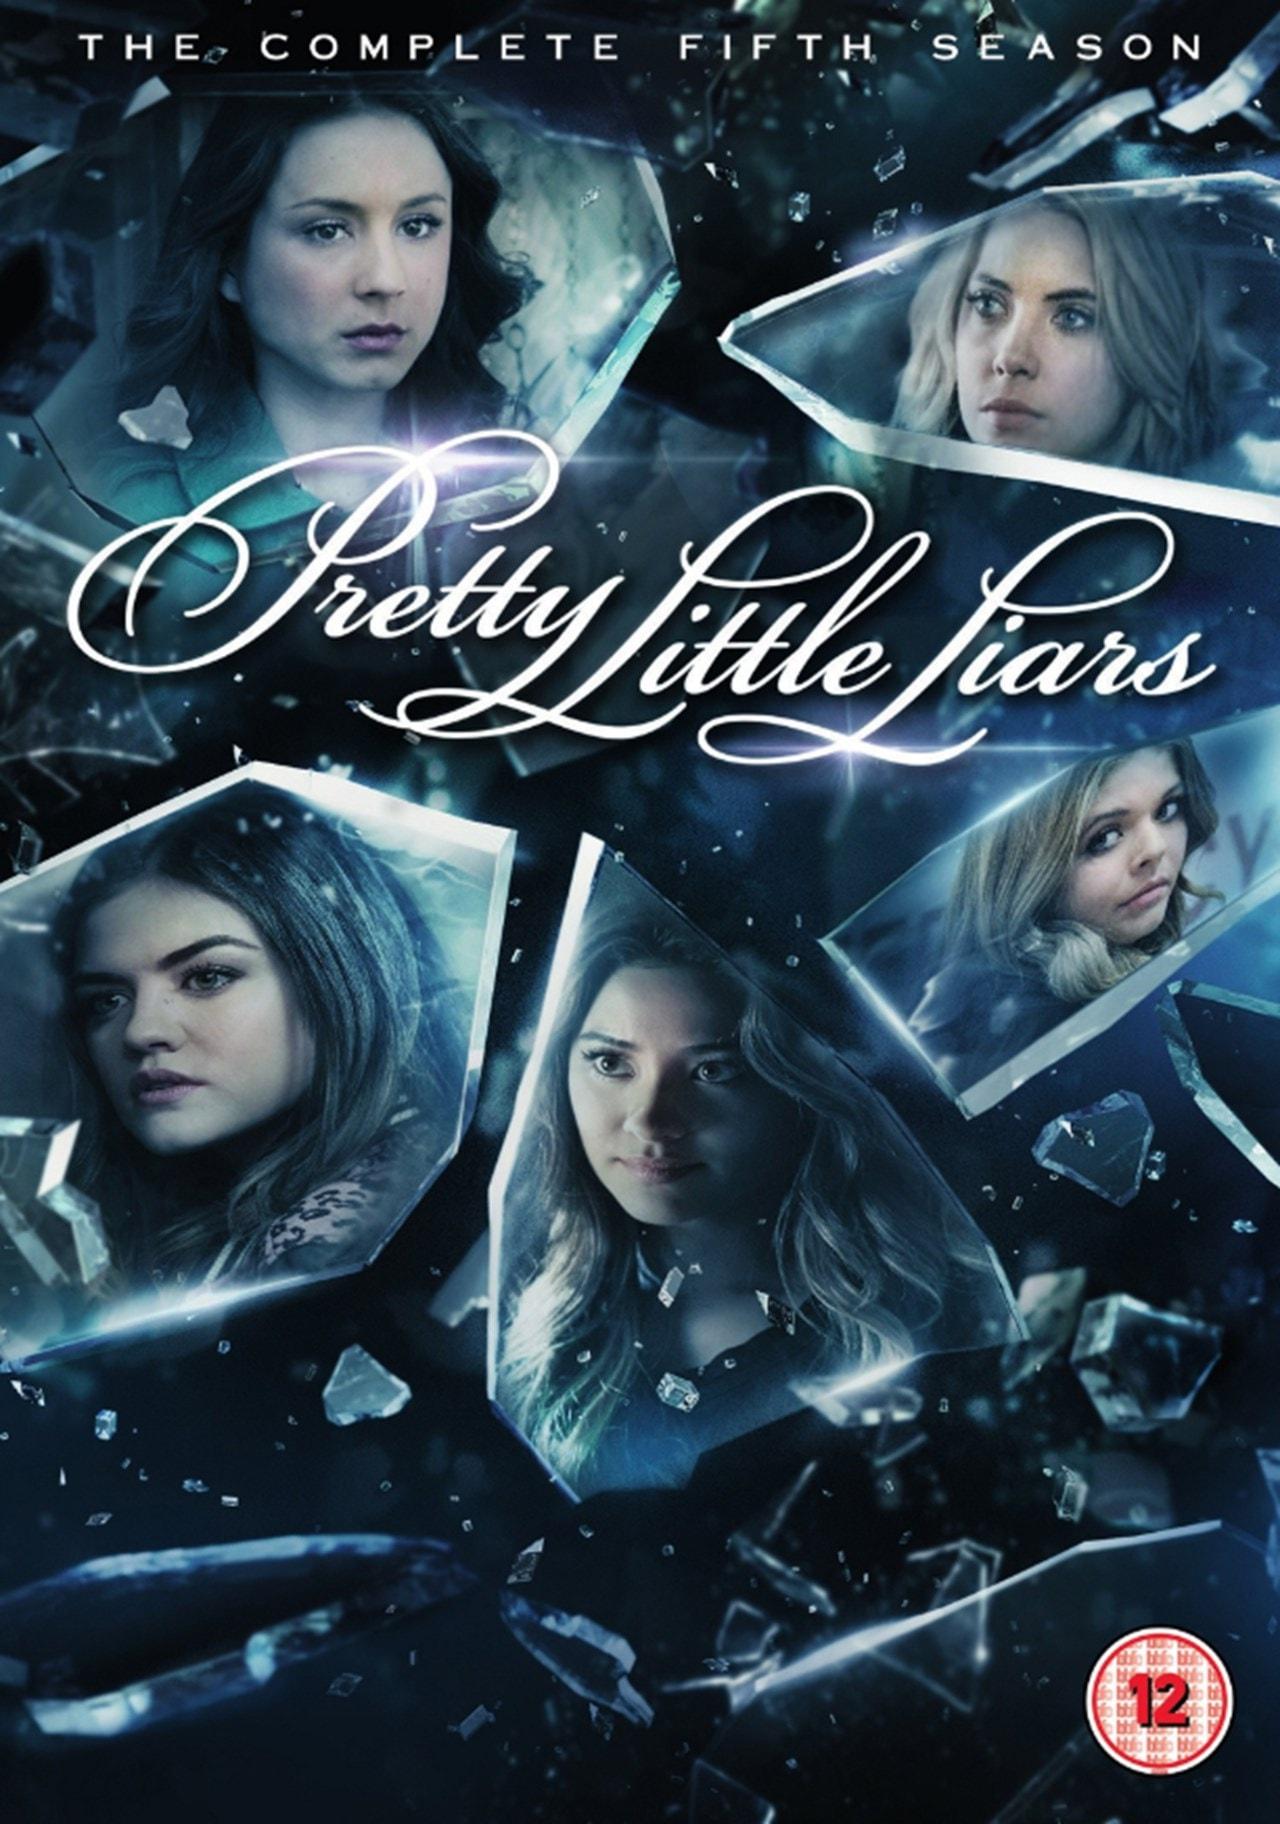 Pretty Little Liars: The Complete Fifth Season - 1